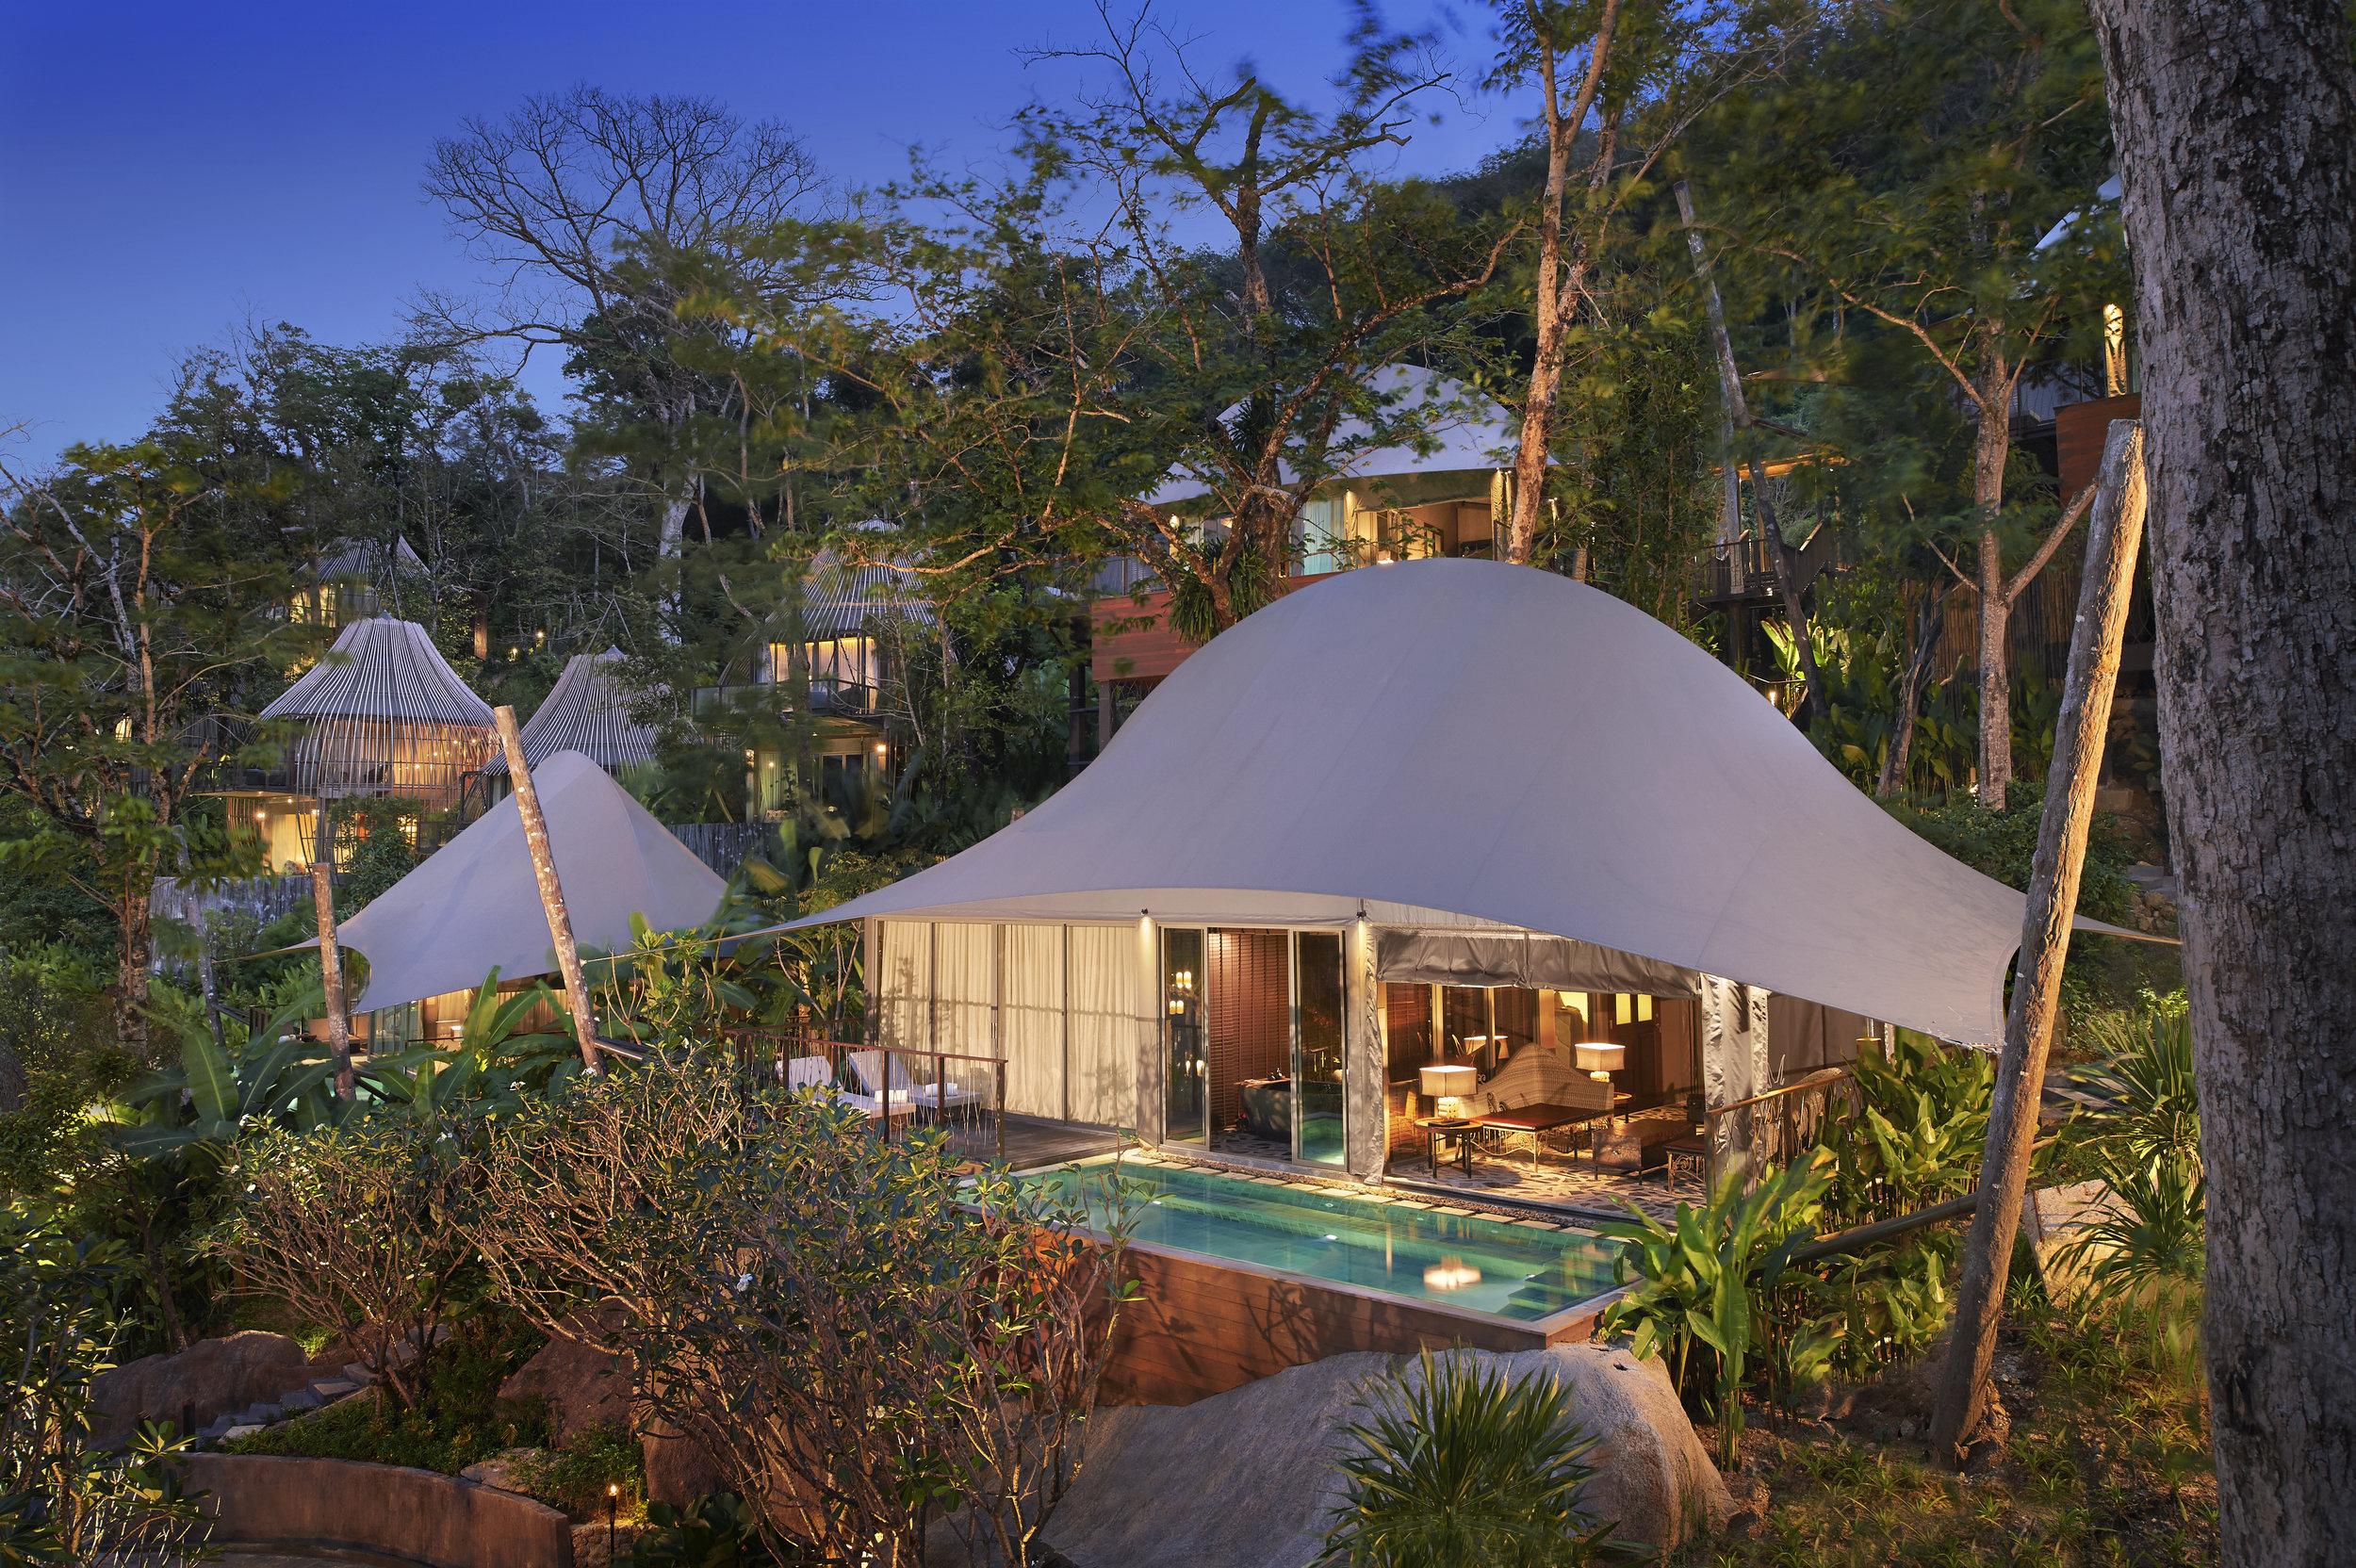 Image property of Keemala Luxury Villas